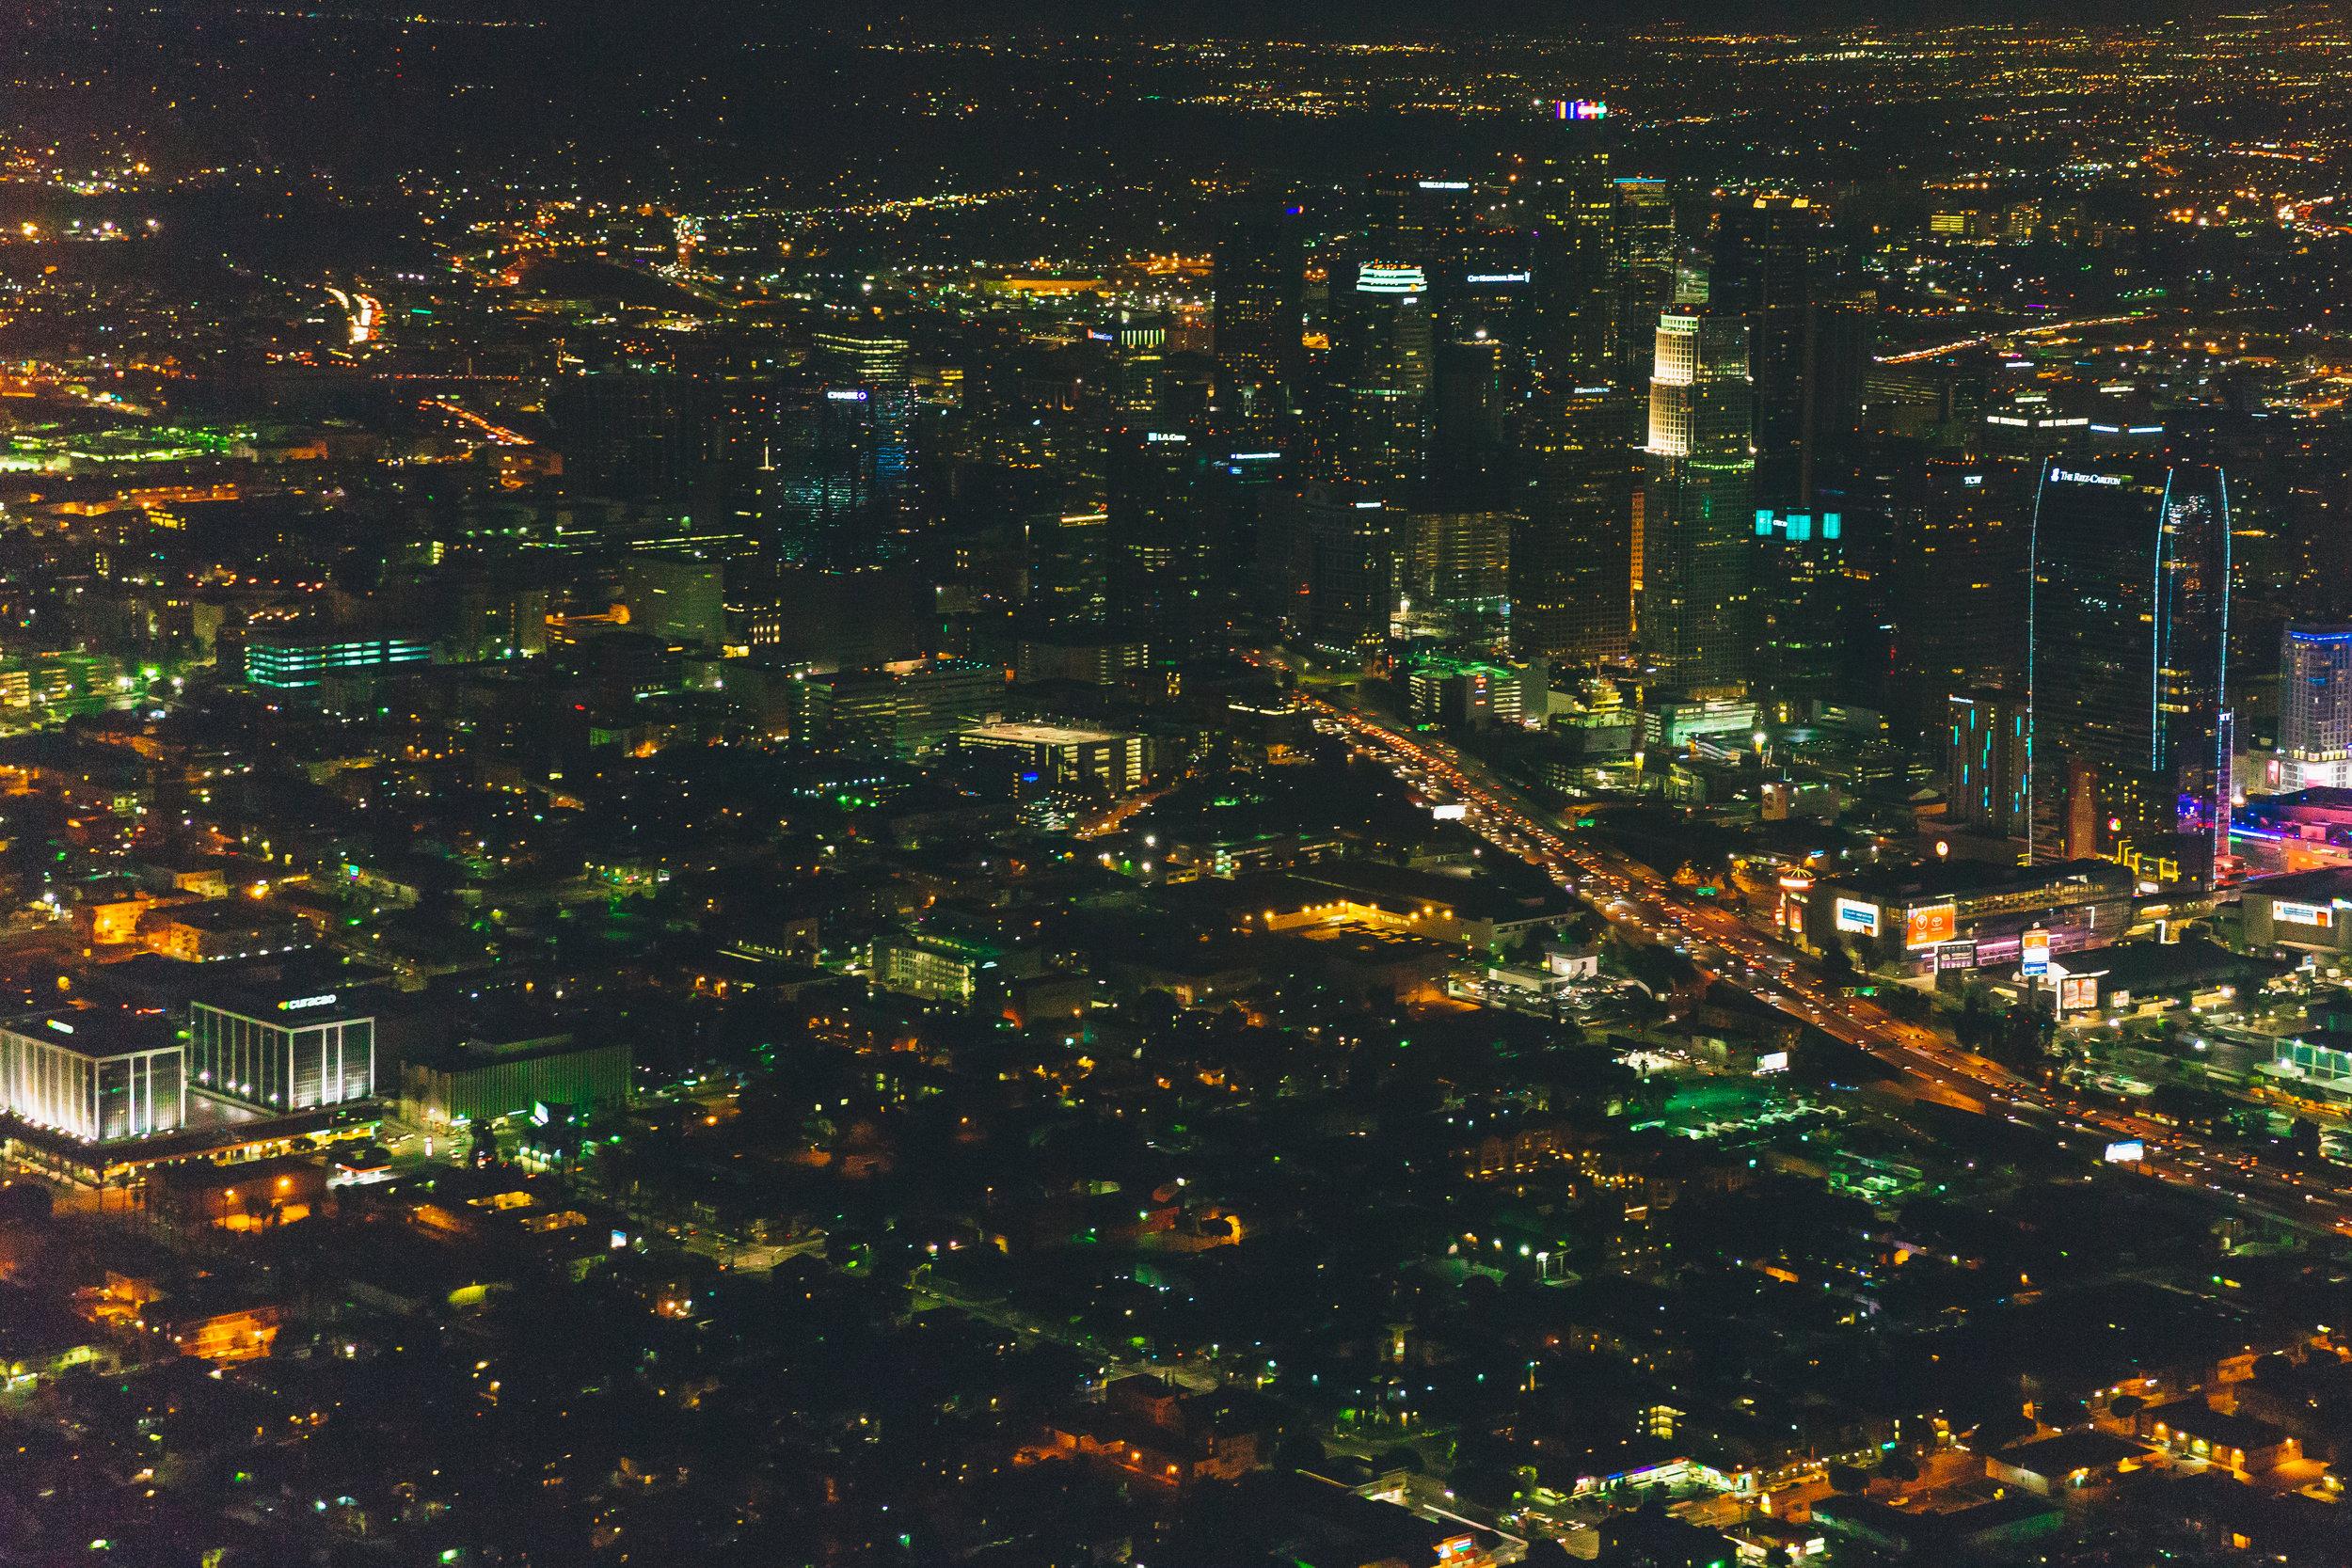 2015-LA-Aerial-016.jpg